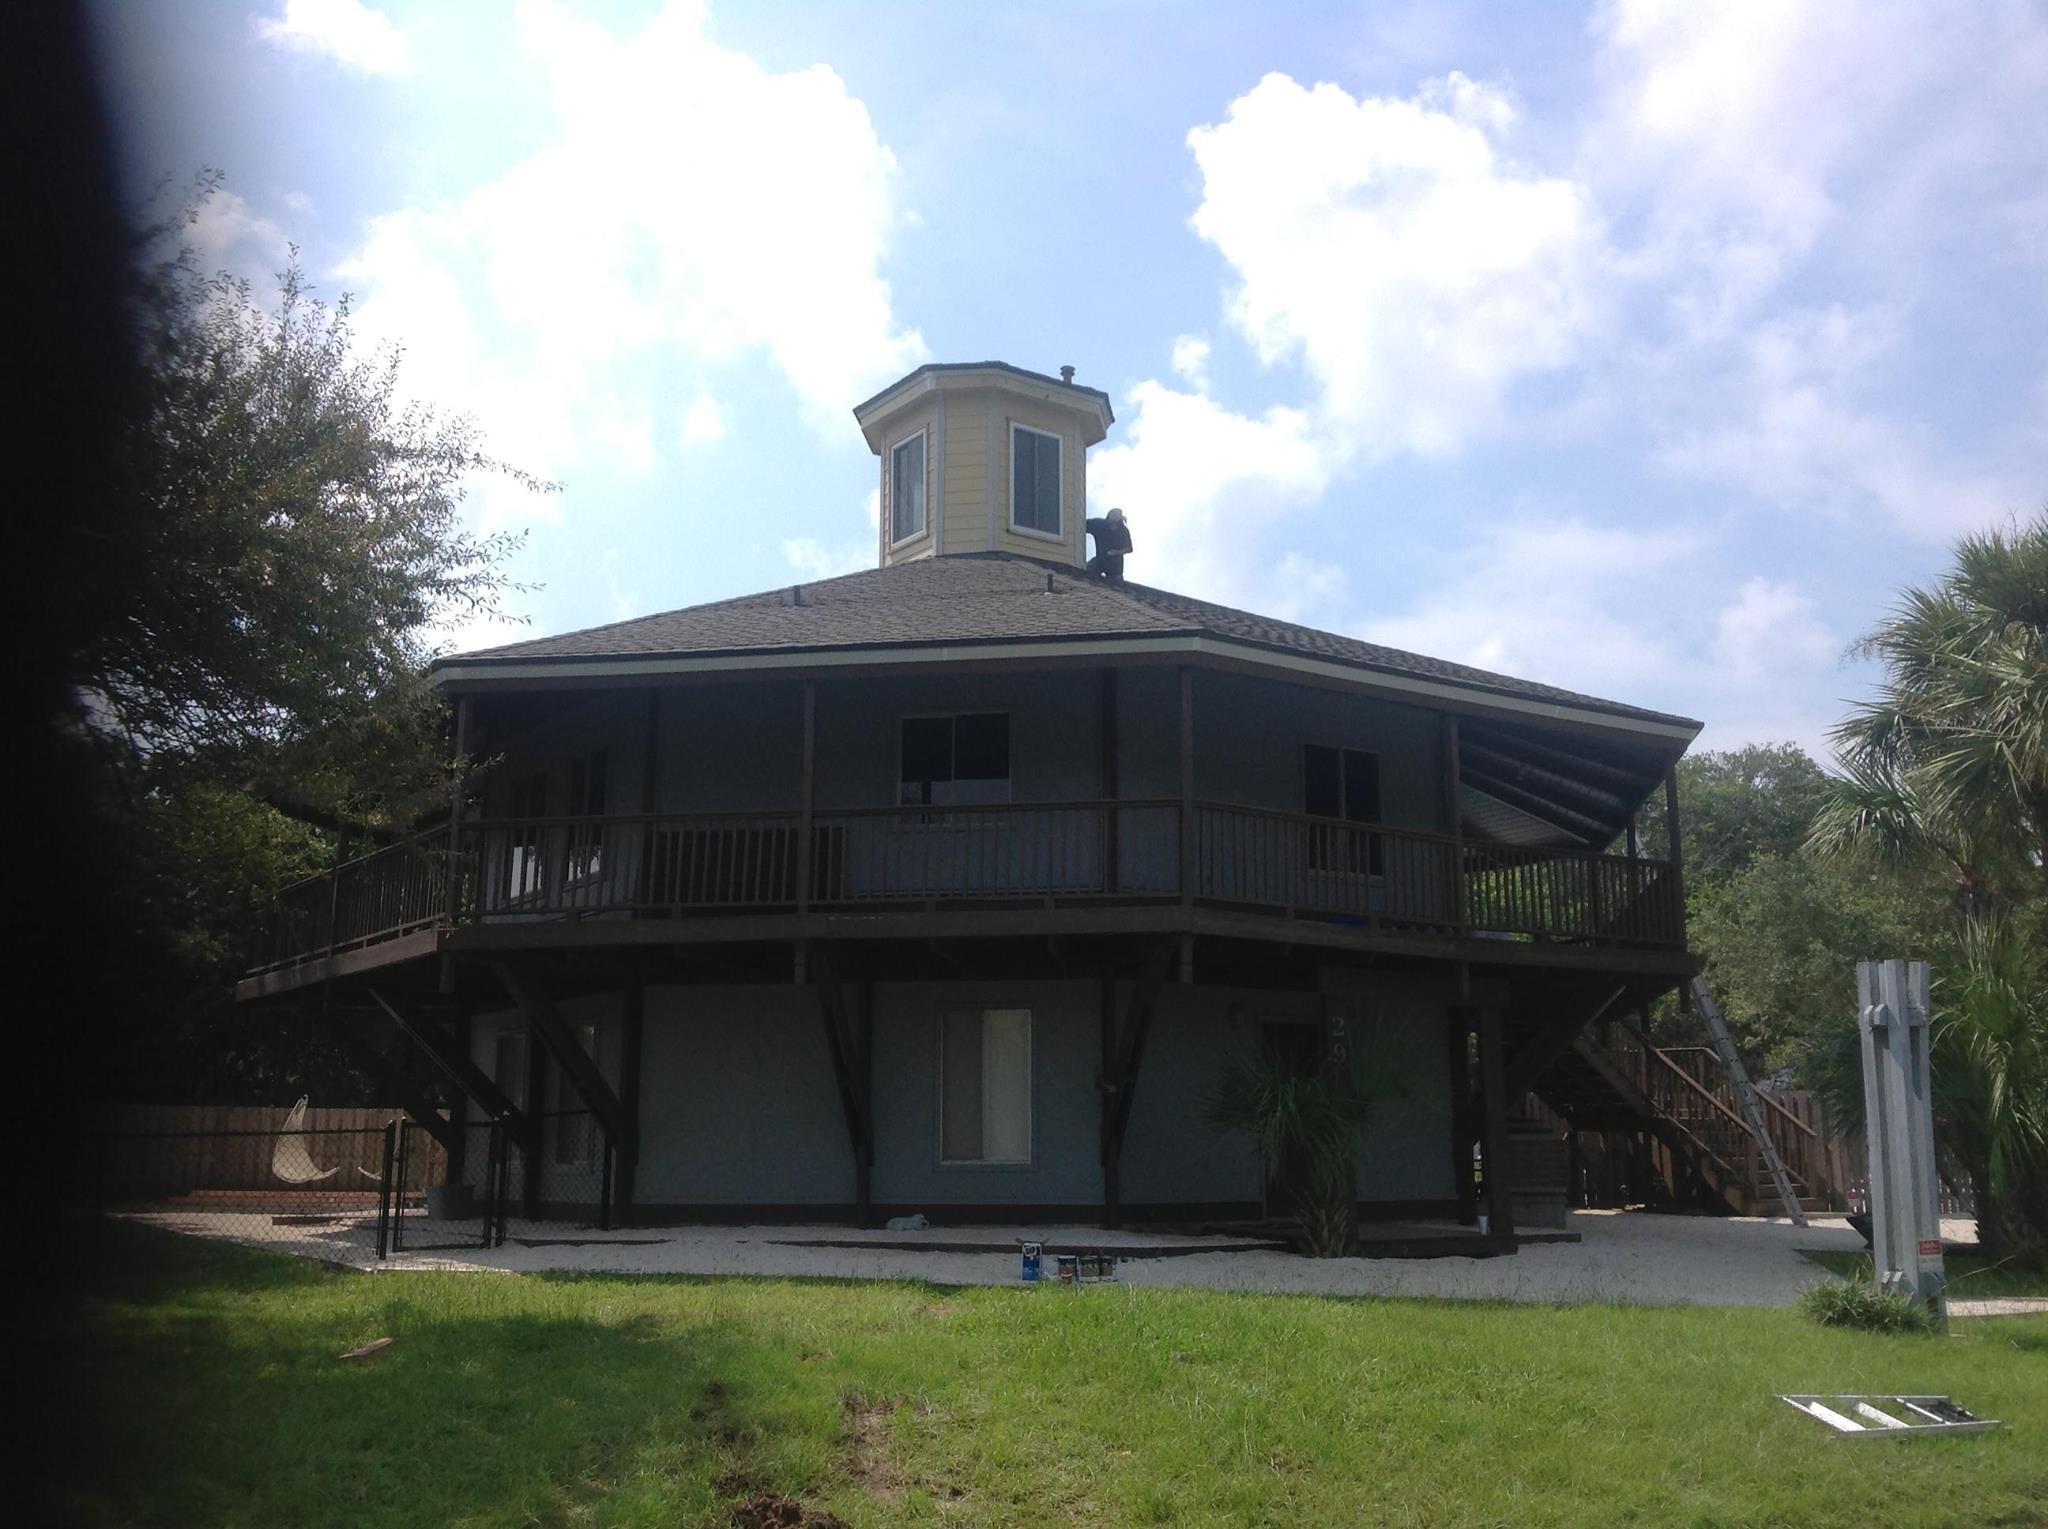 RoofCrafters-Savannah image 75